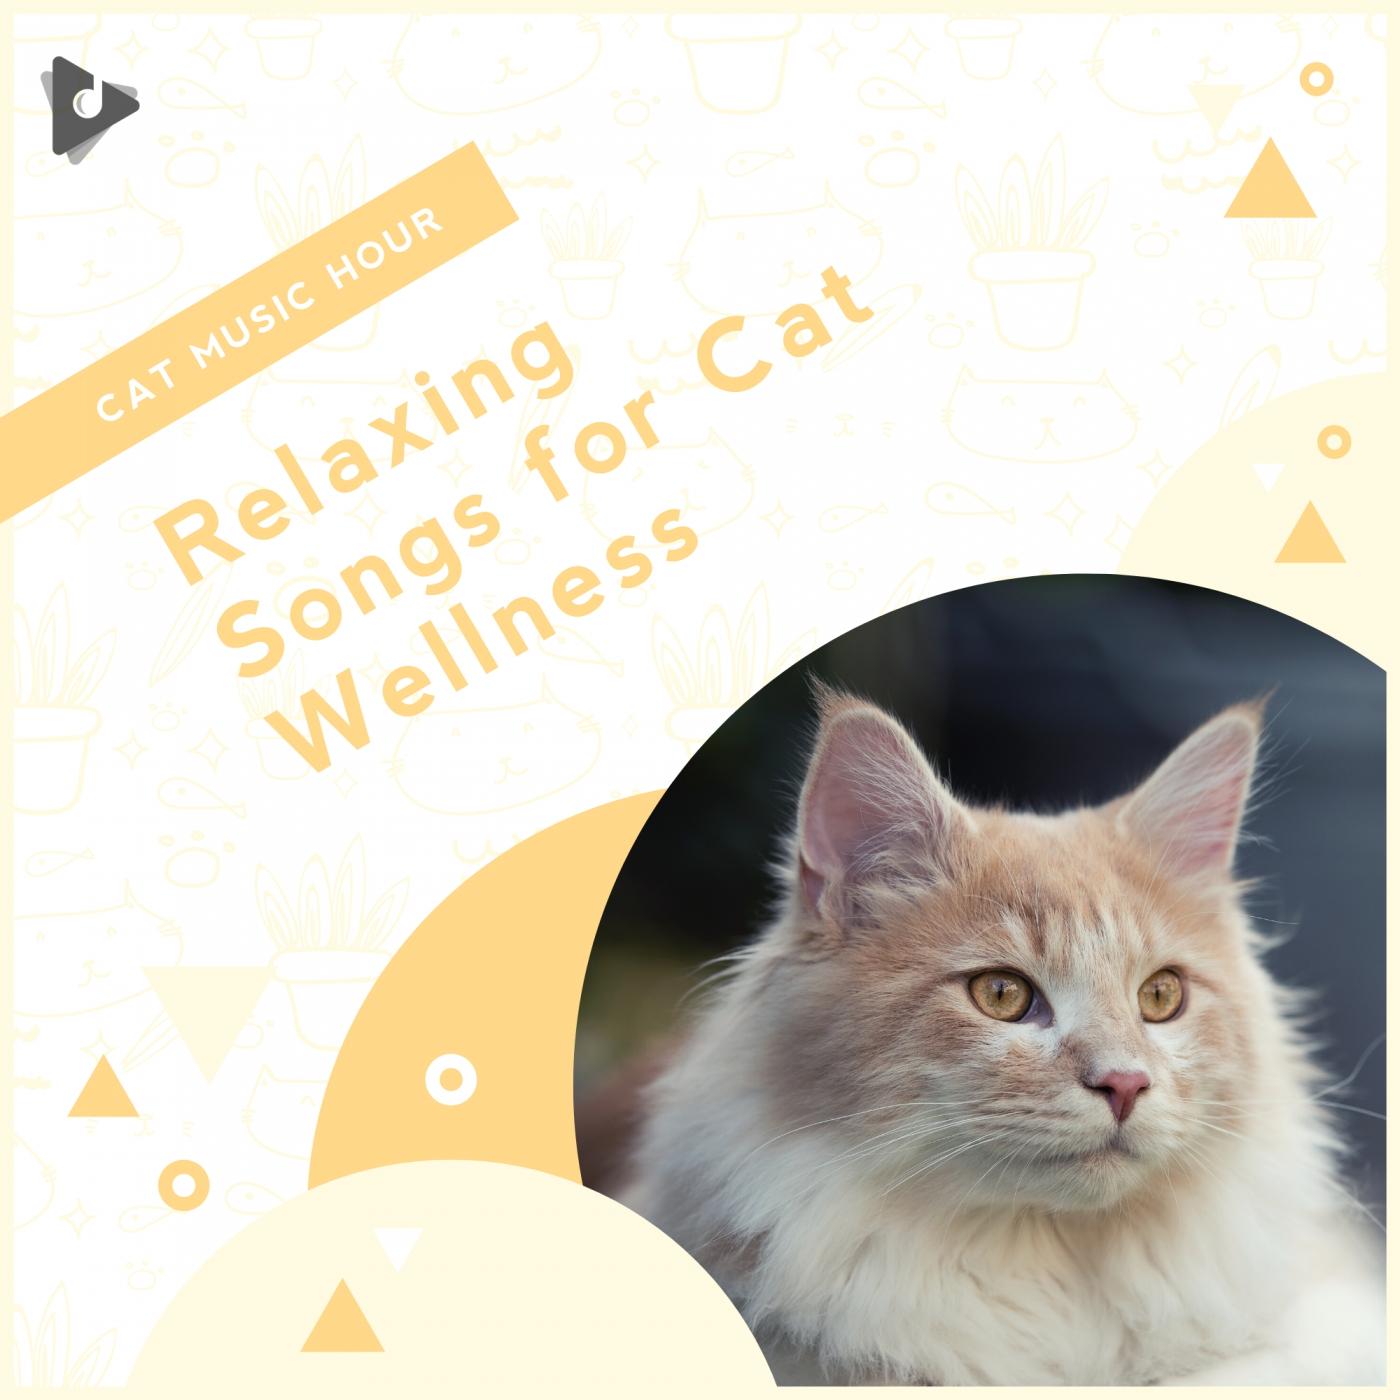 Relaxing Songs for Cat Wellness